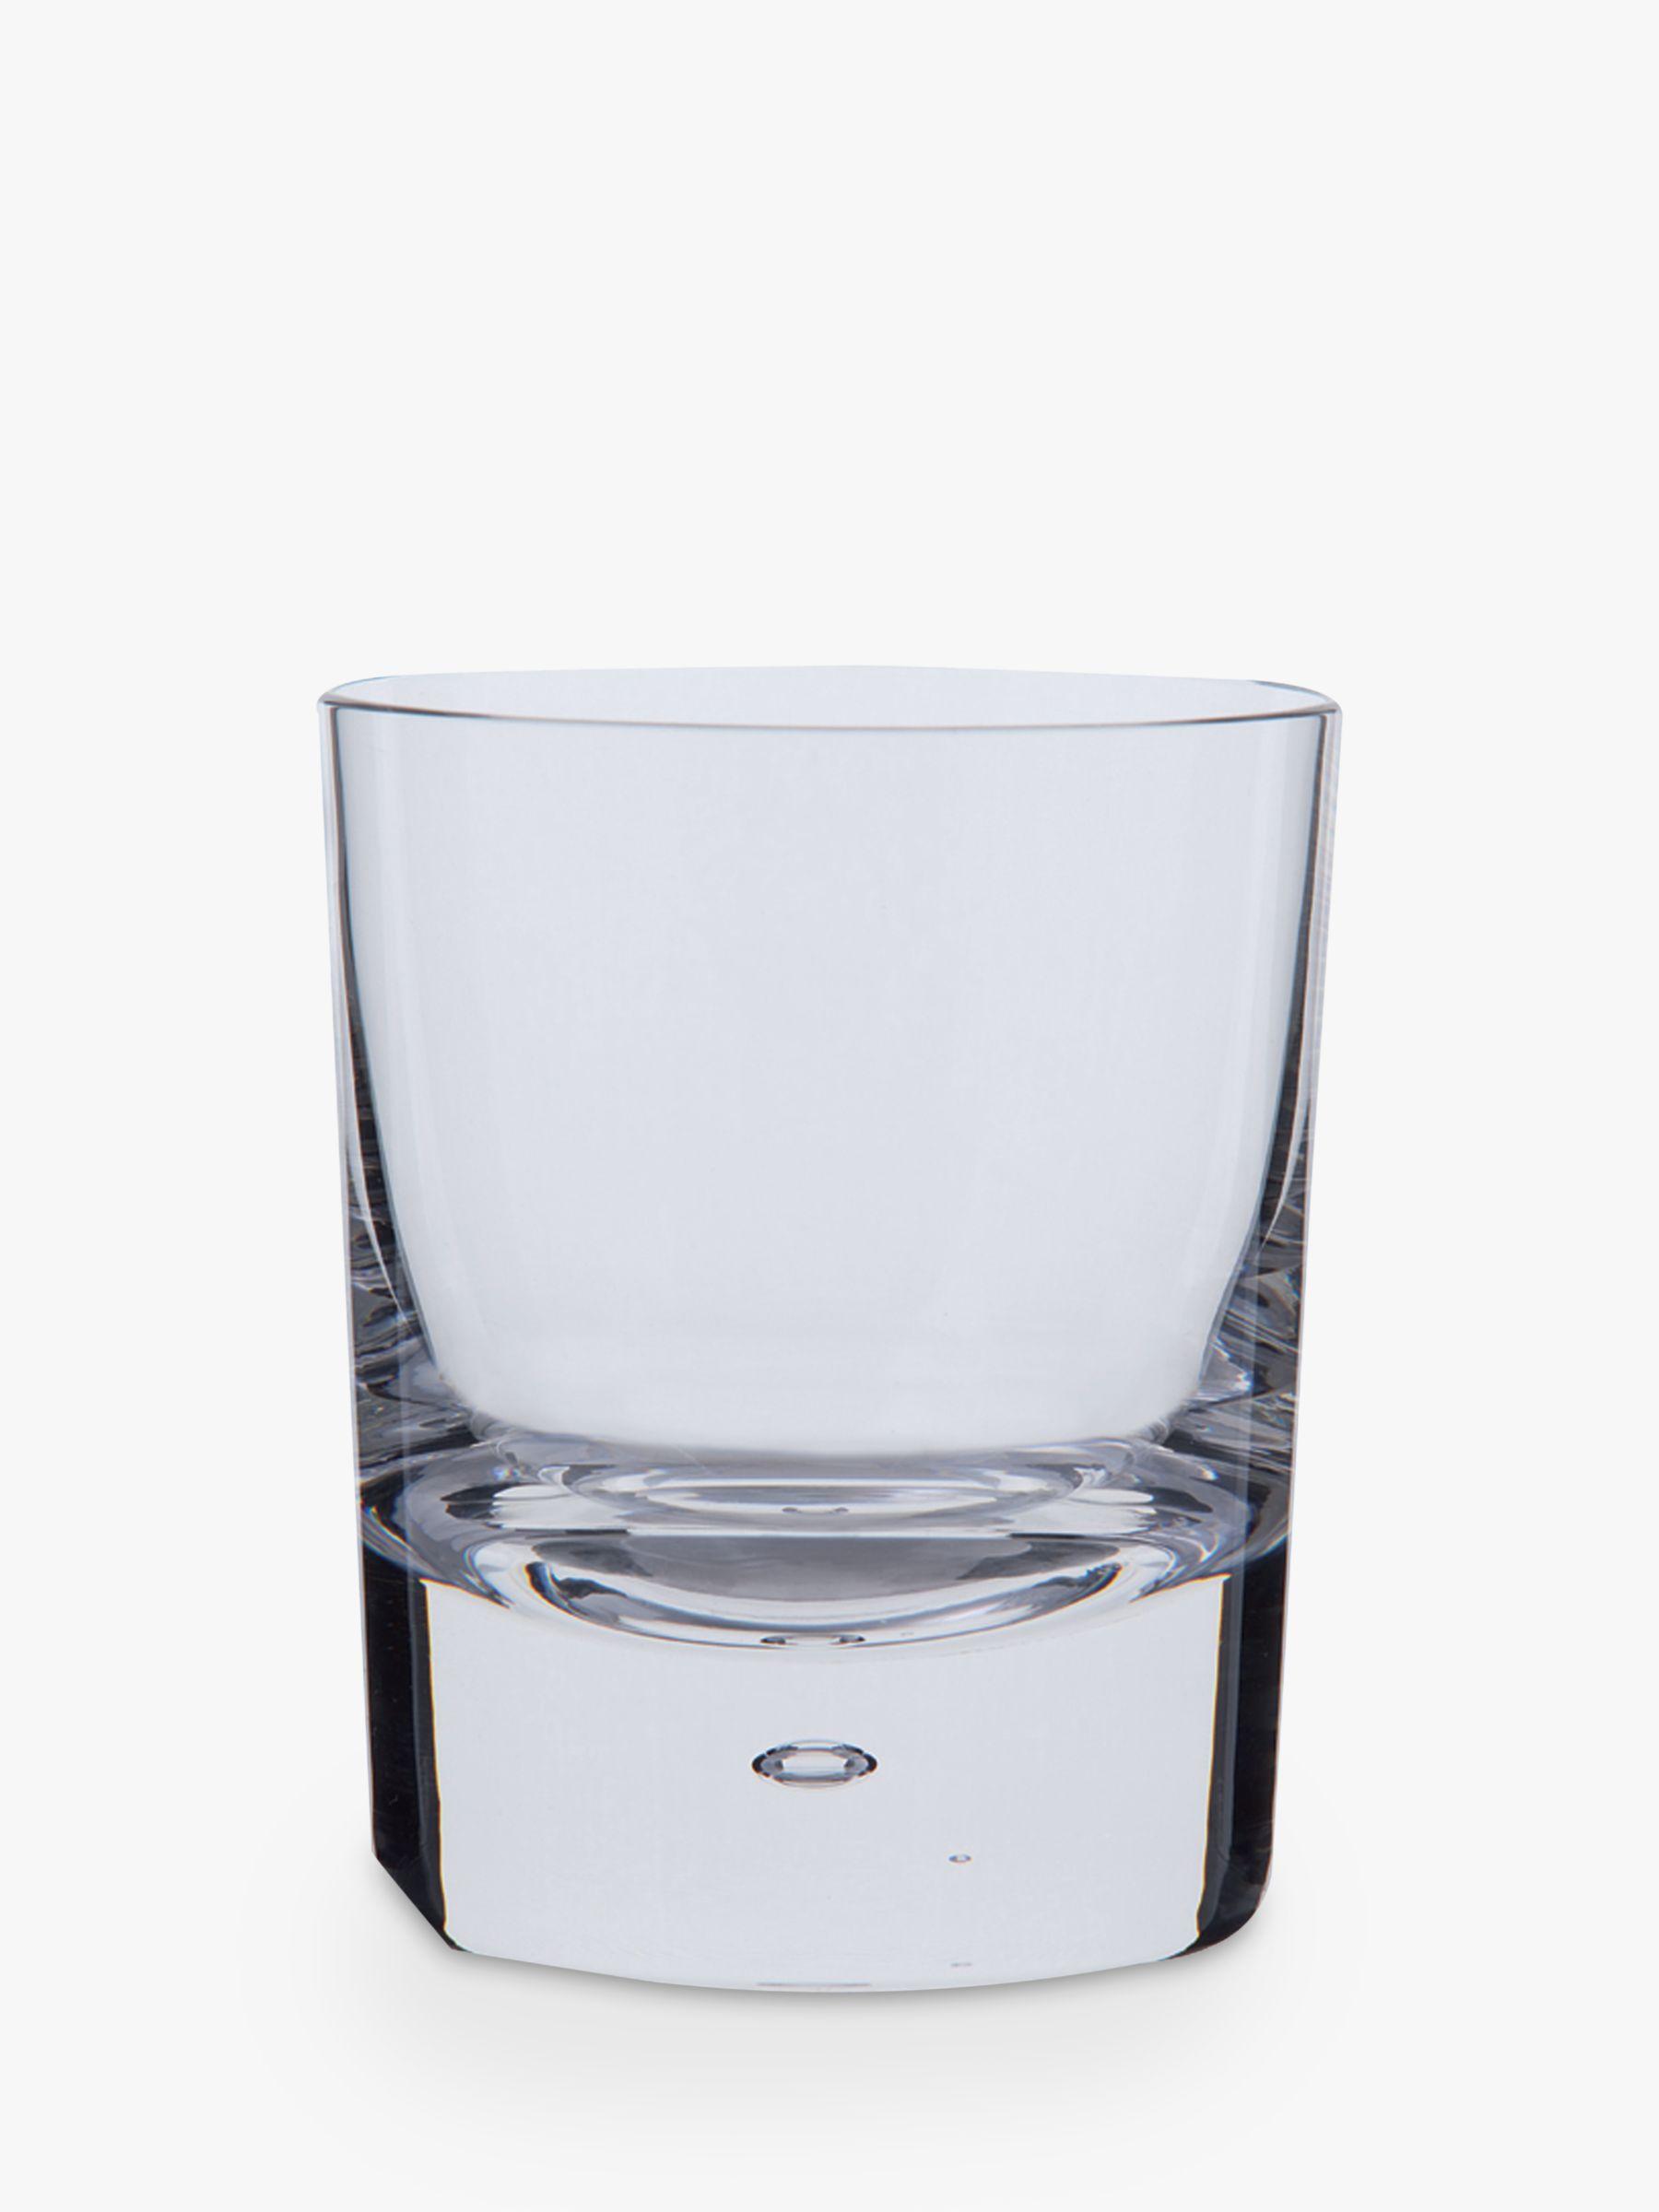 Dartington Crystal Dartington Crystal Personalised Exmoor Old Fashioned Whisky Glass (Single), Palace Script Font